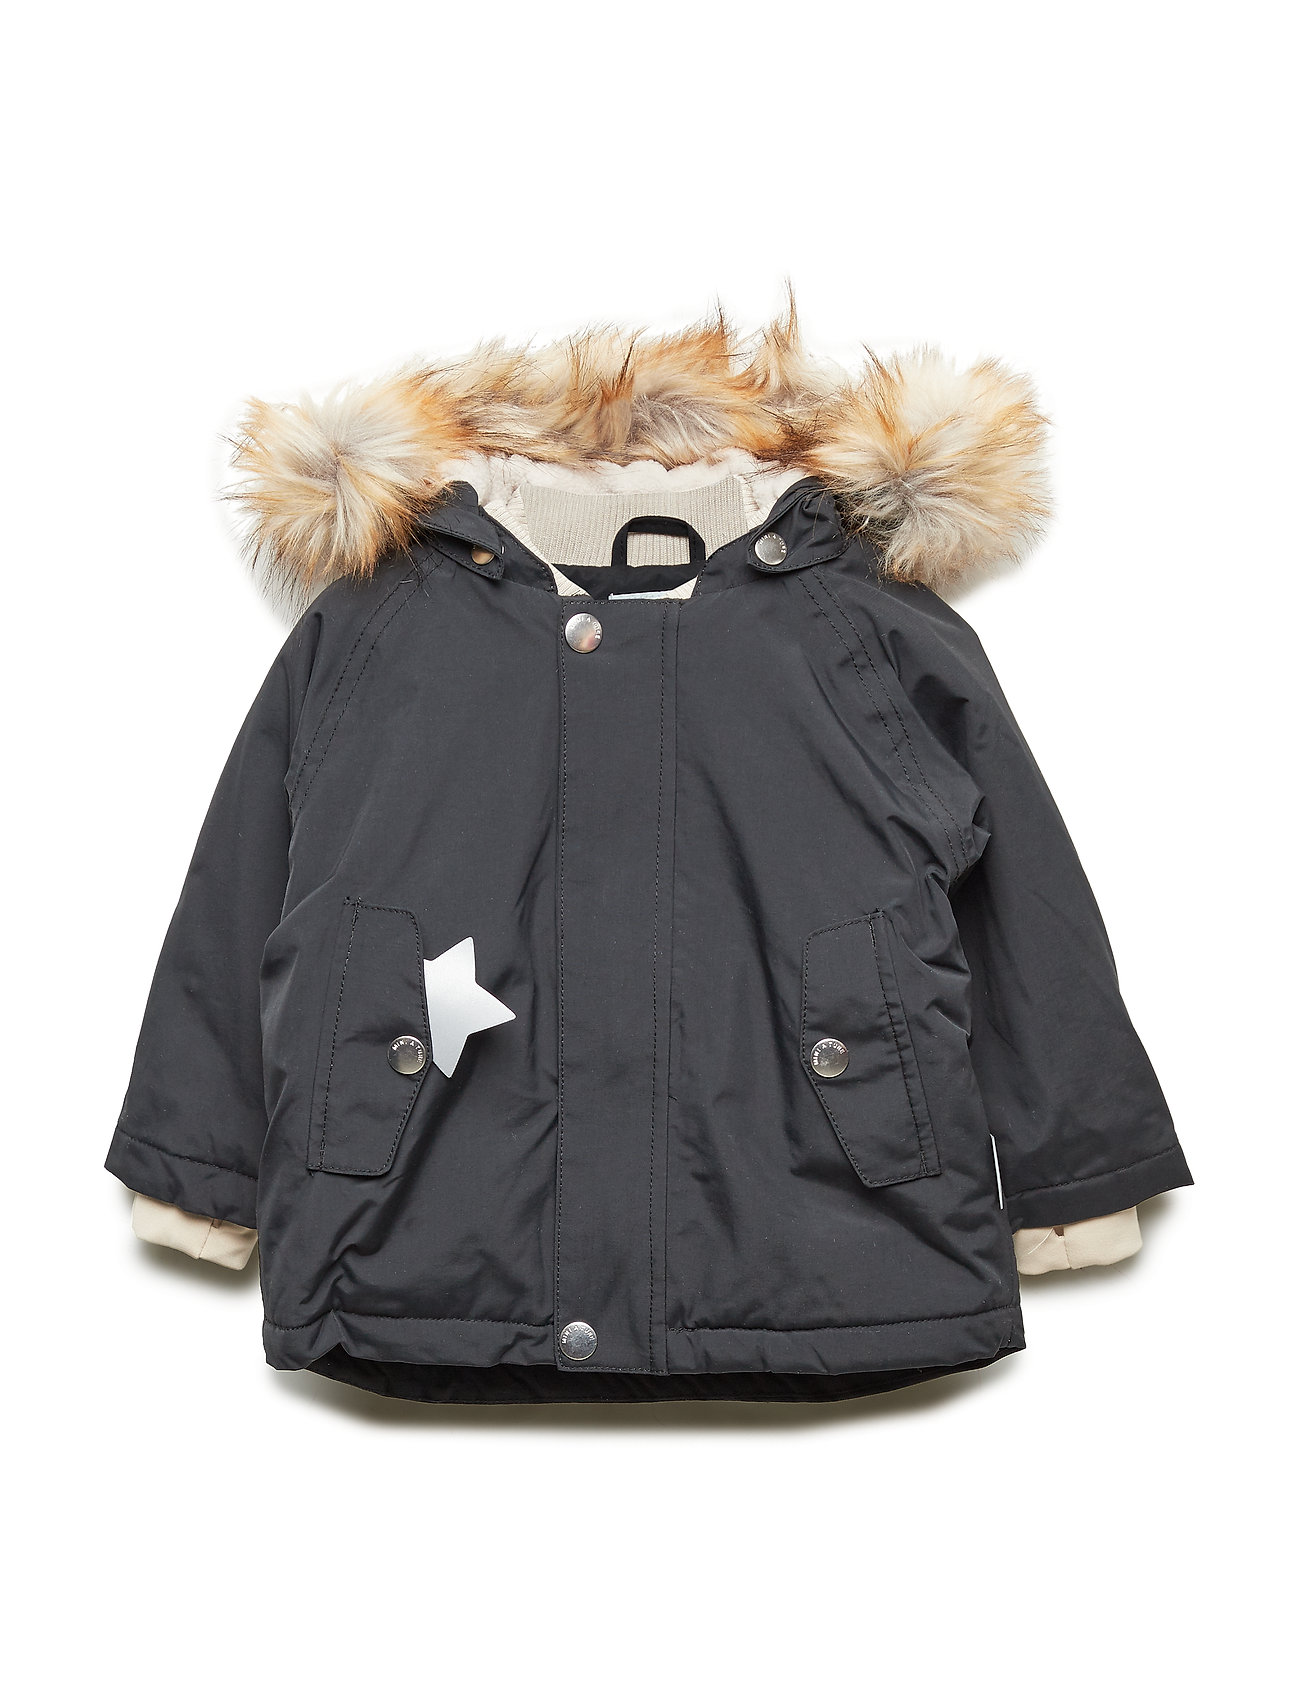 Mini A Ture Wally Faux Fur Jacket, M